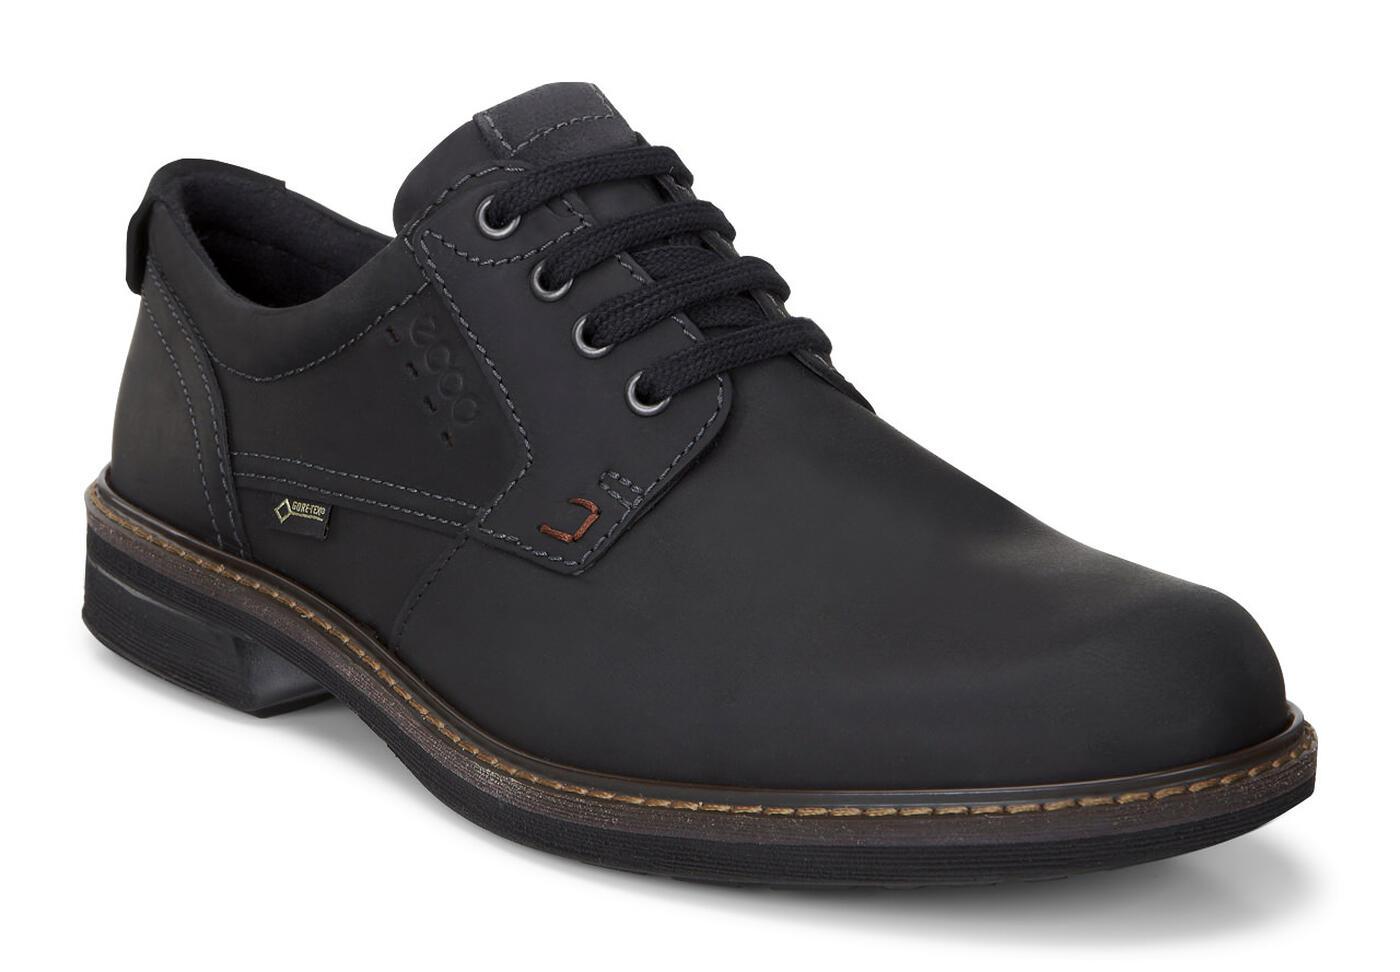 Chaussure tout-aller ECCO TURN pour hommes